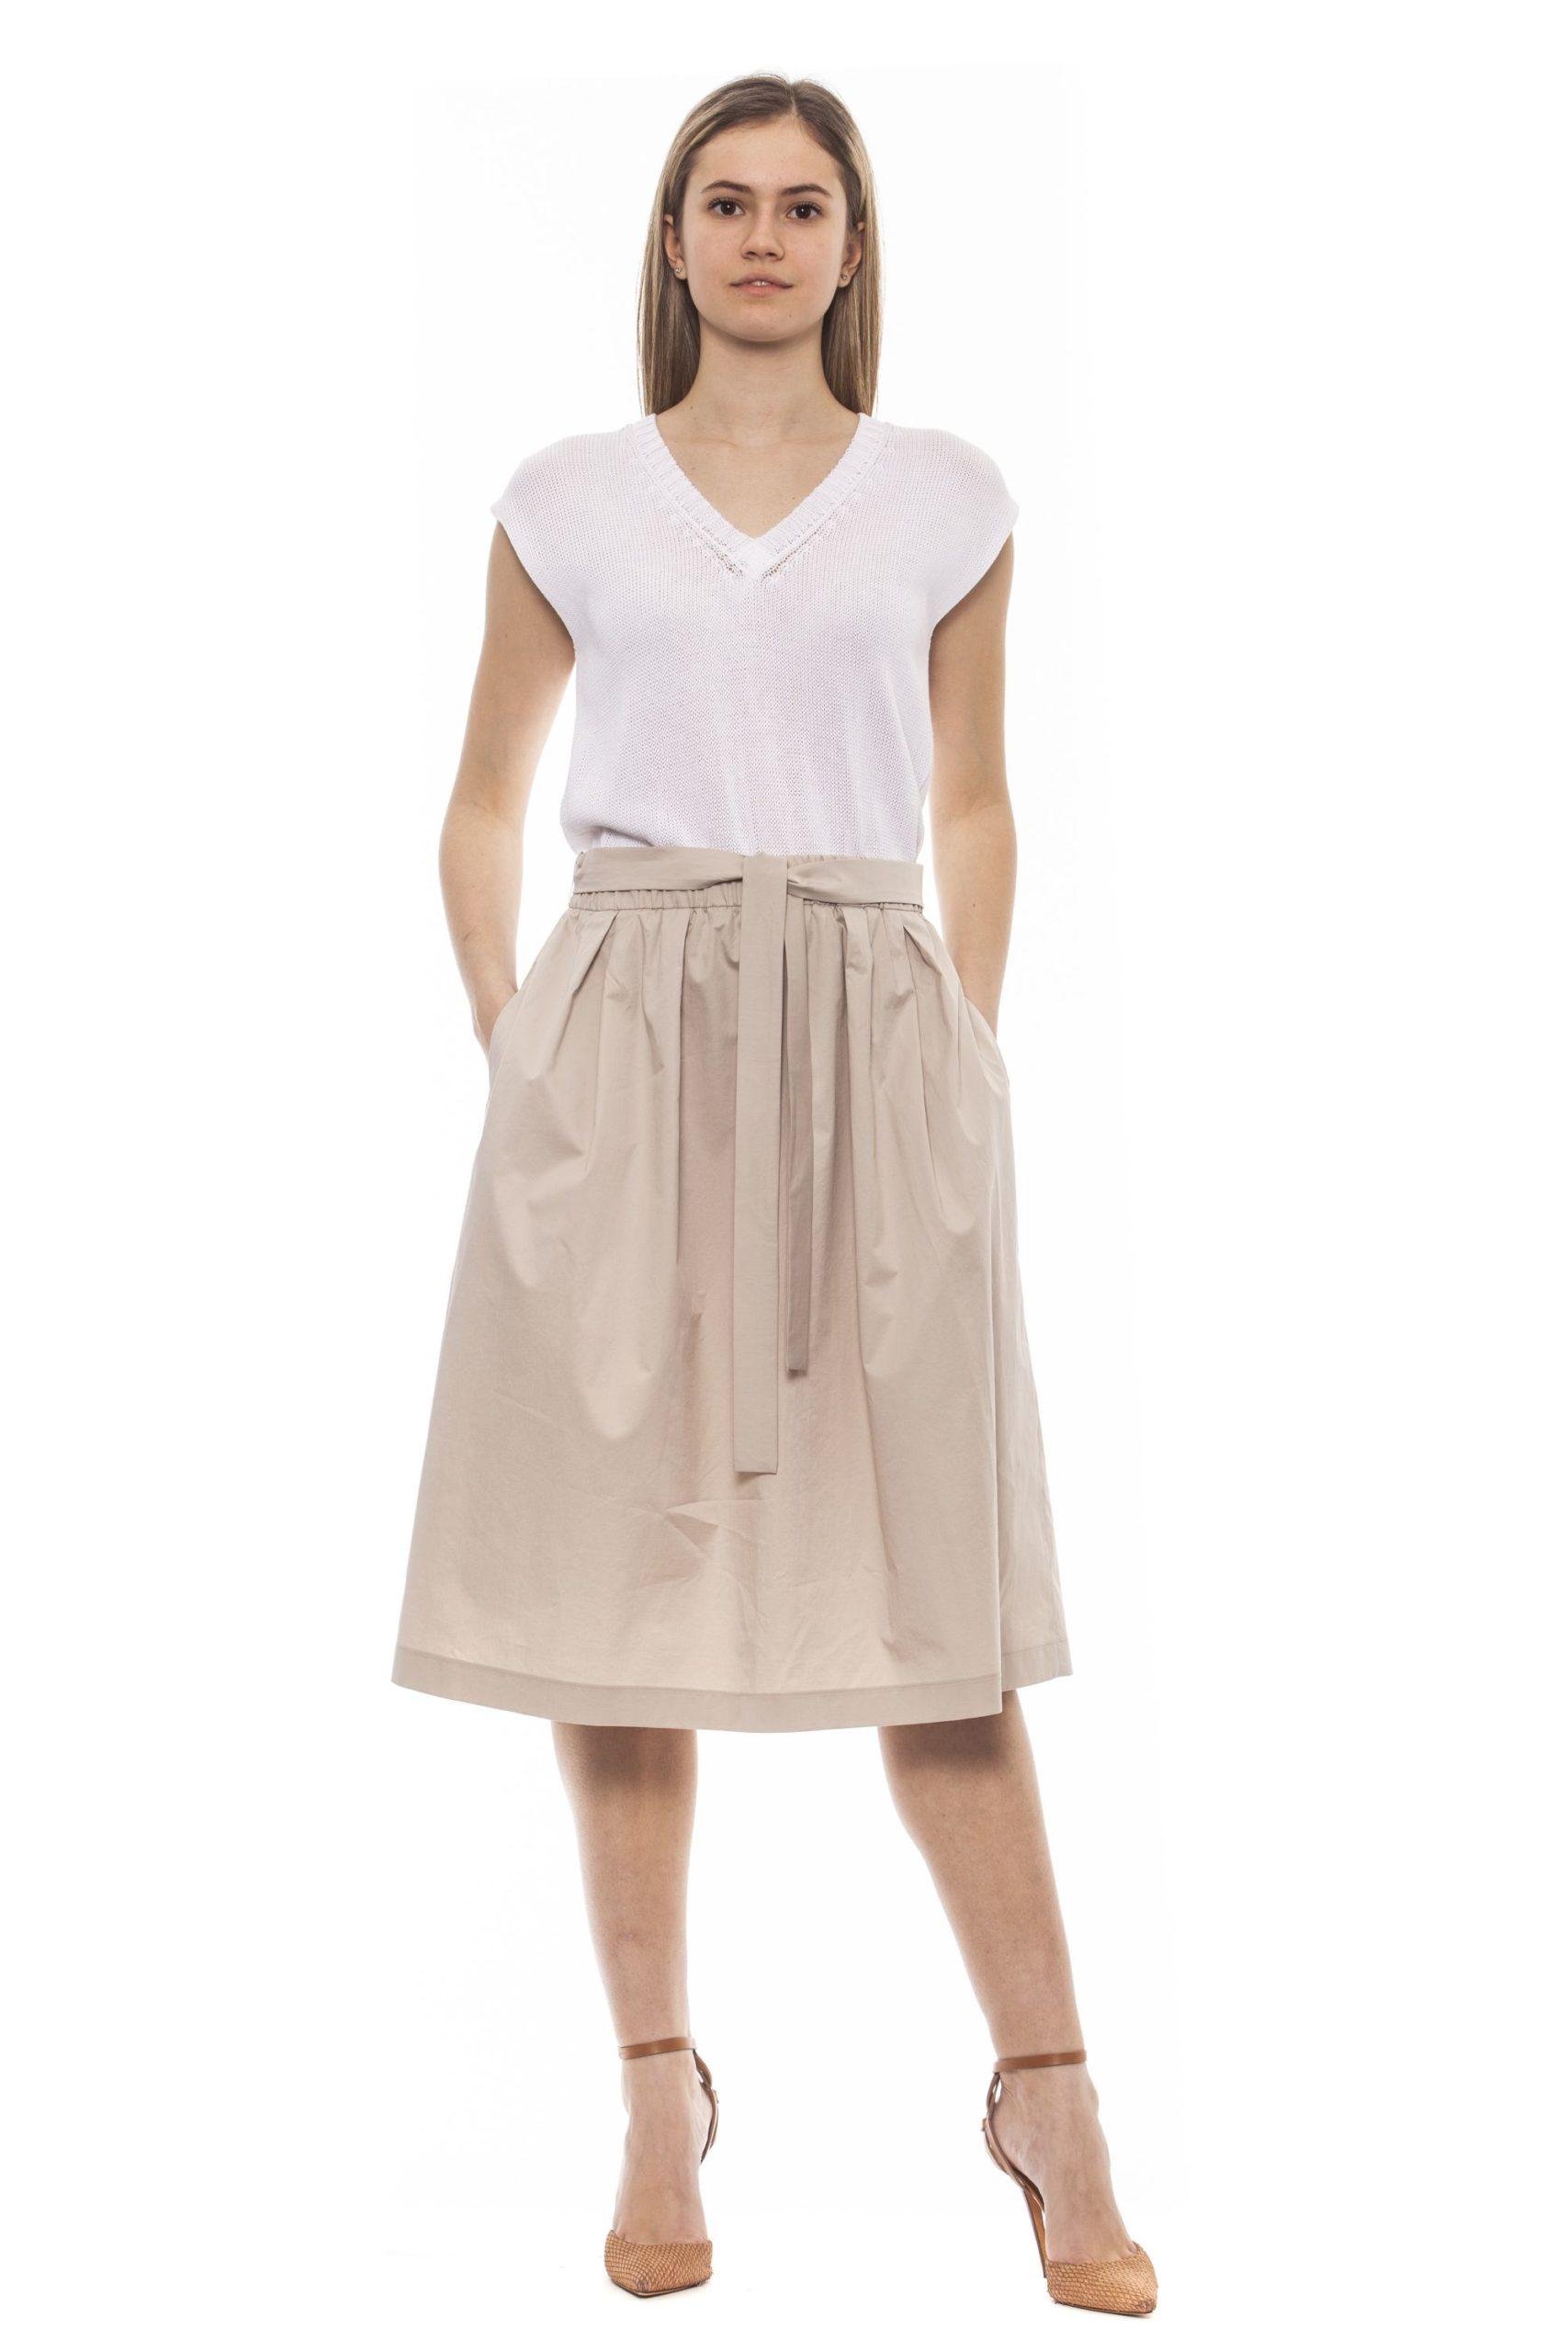 Peserico Women's Bianco Dress White PE1383297 - IT42 | S